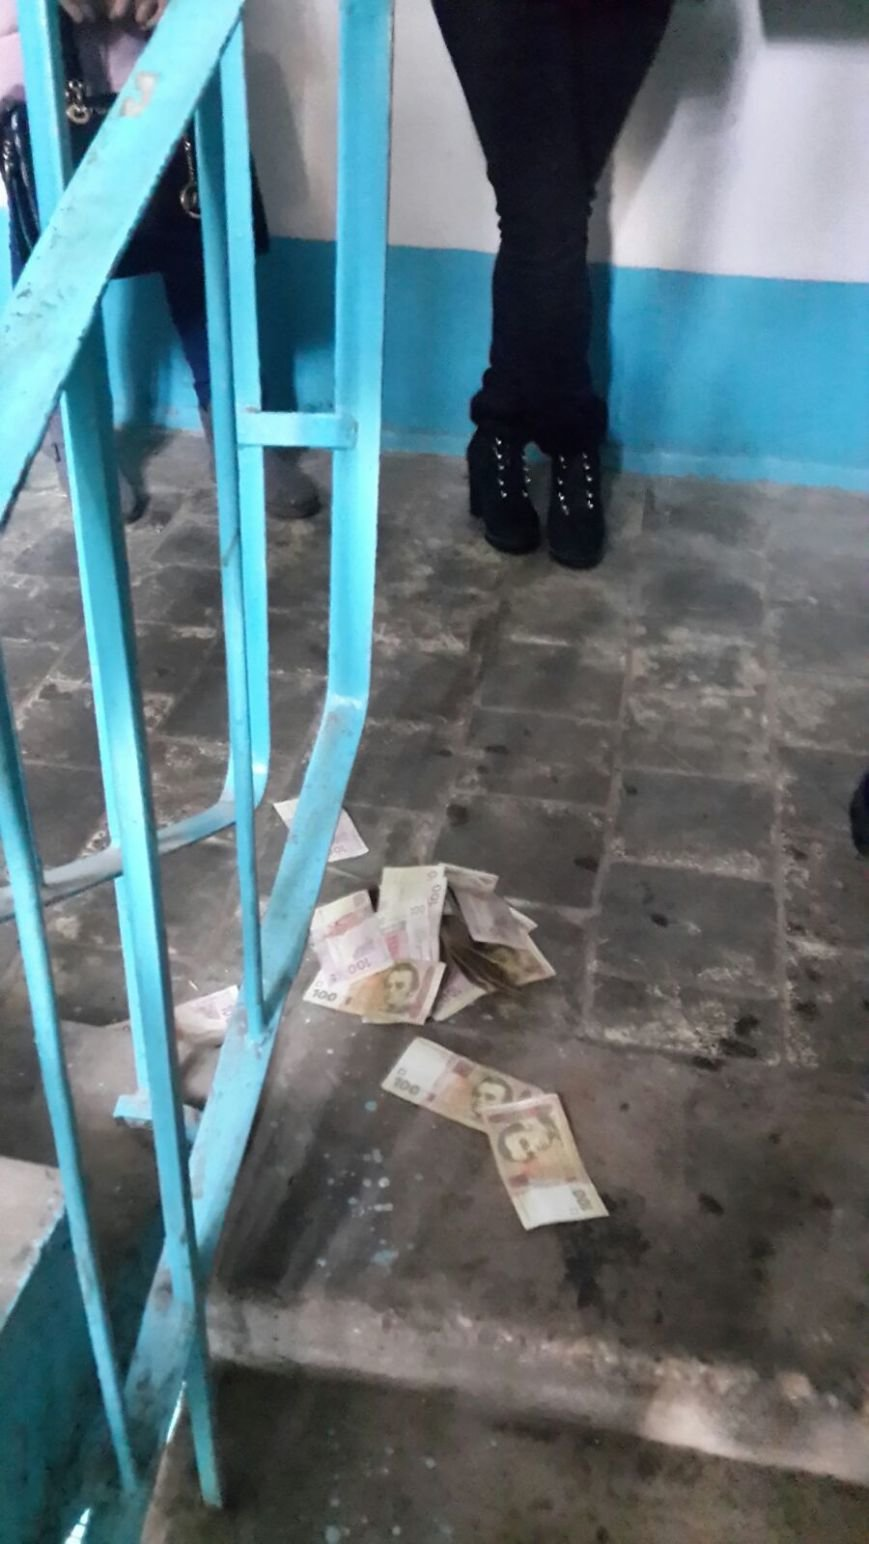 В Бахмуте преподавателя одного из ВУЗов задержали на взятке, фото-2